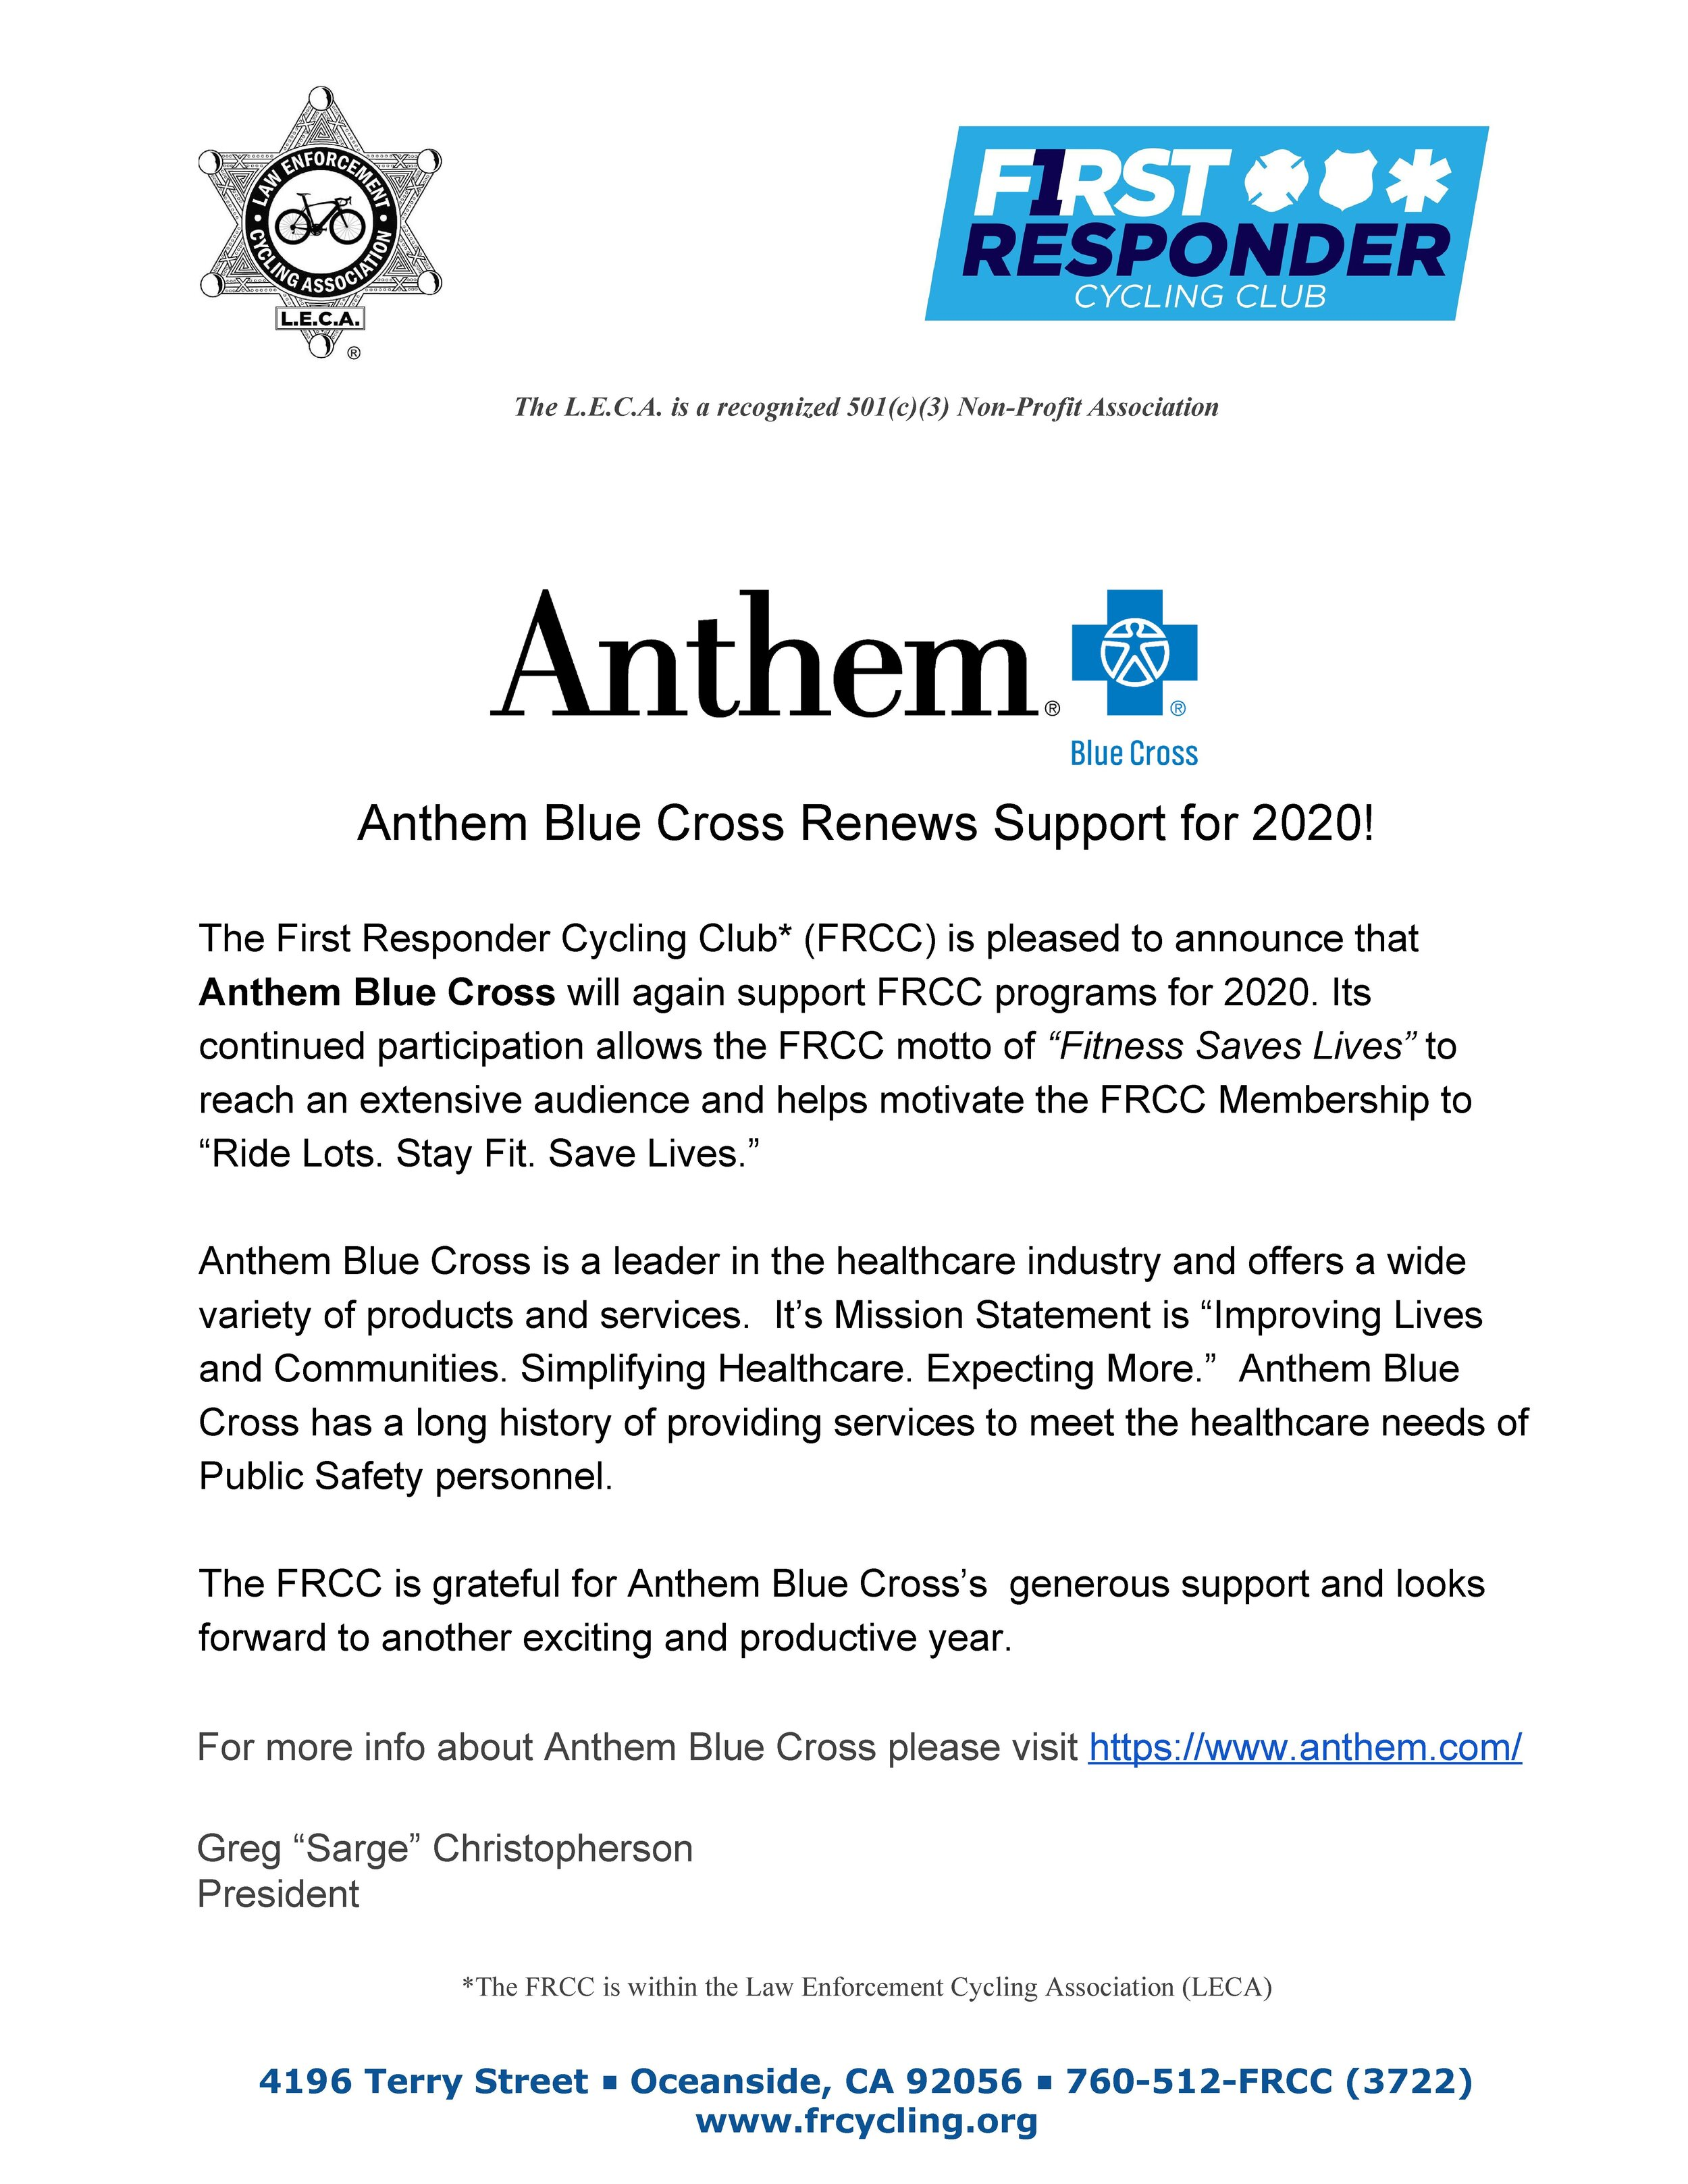 Anthem Announce Renew 2020.jpg